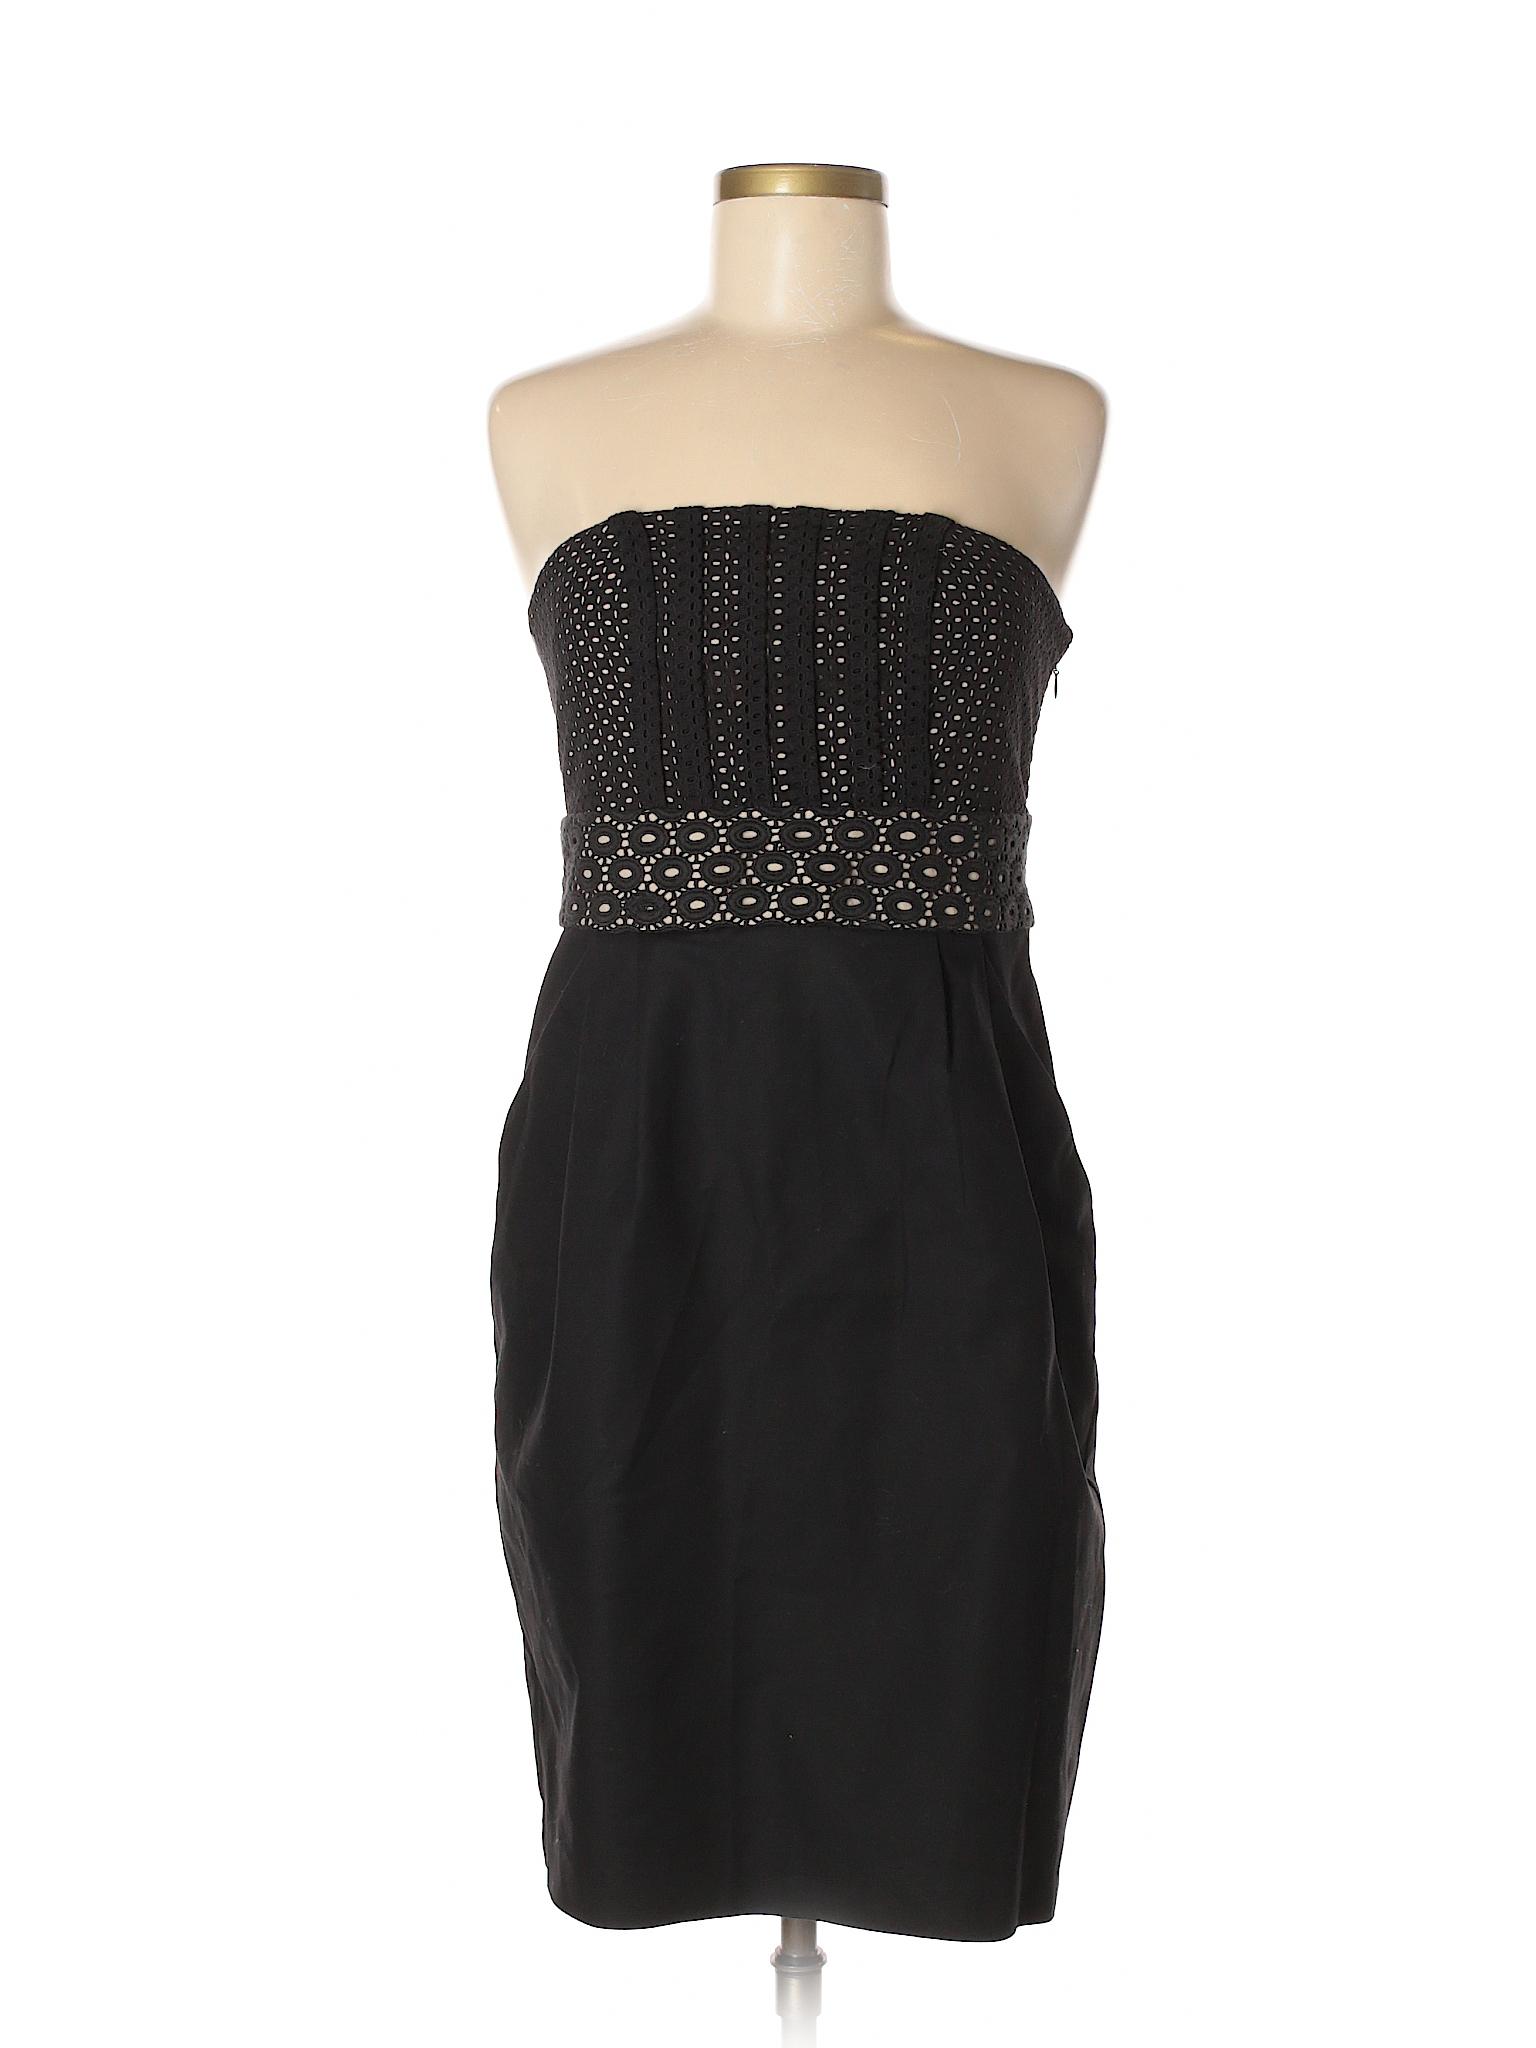 Ann Casual LOFT Taylor Boutique winter Dress Cw0YW5